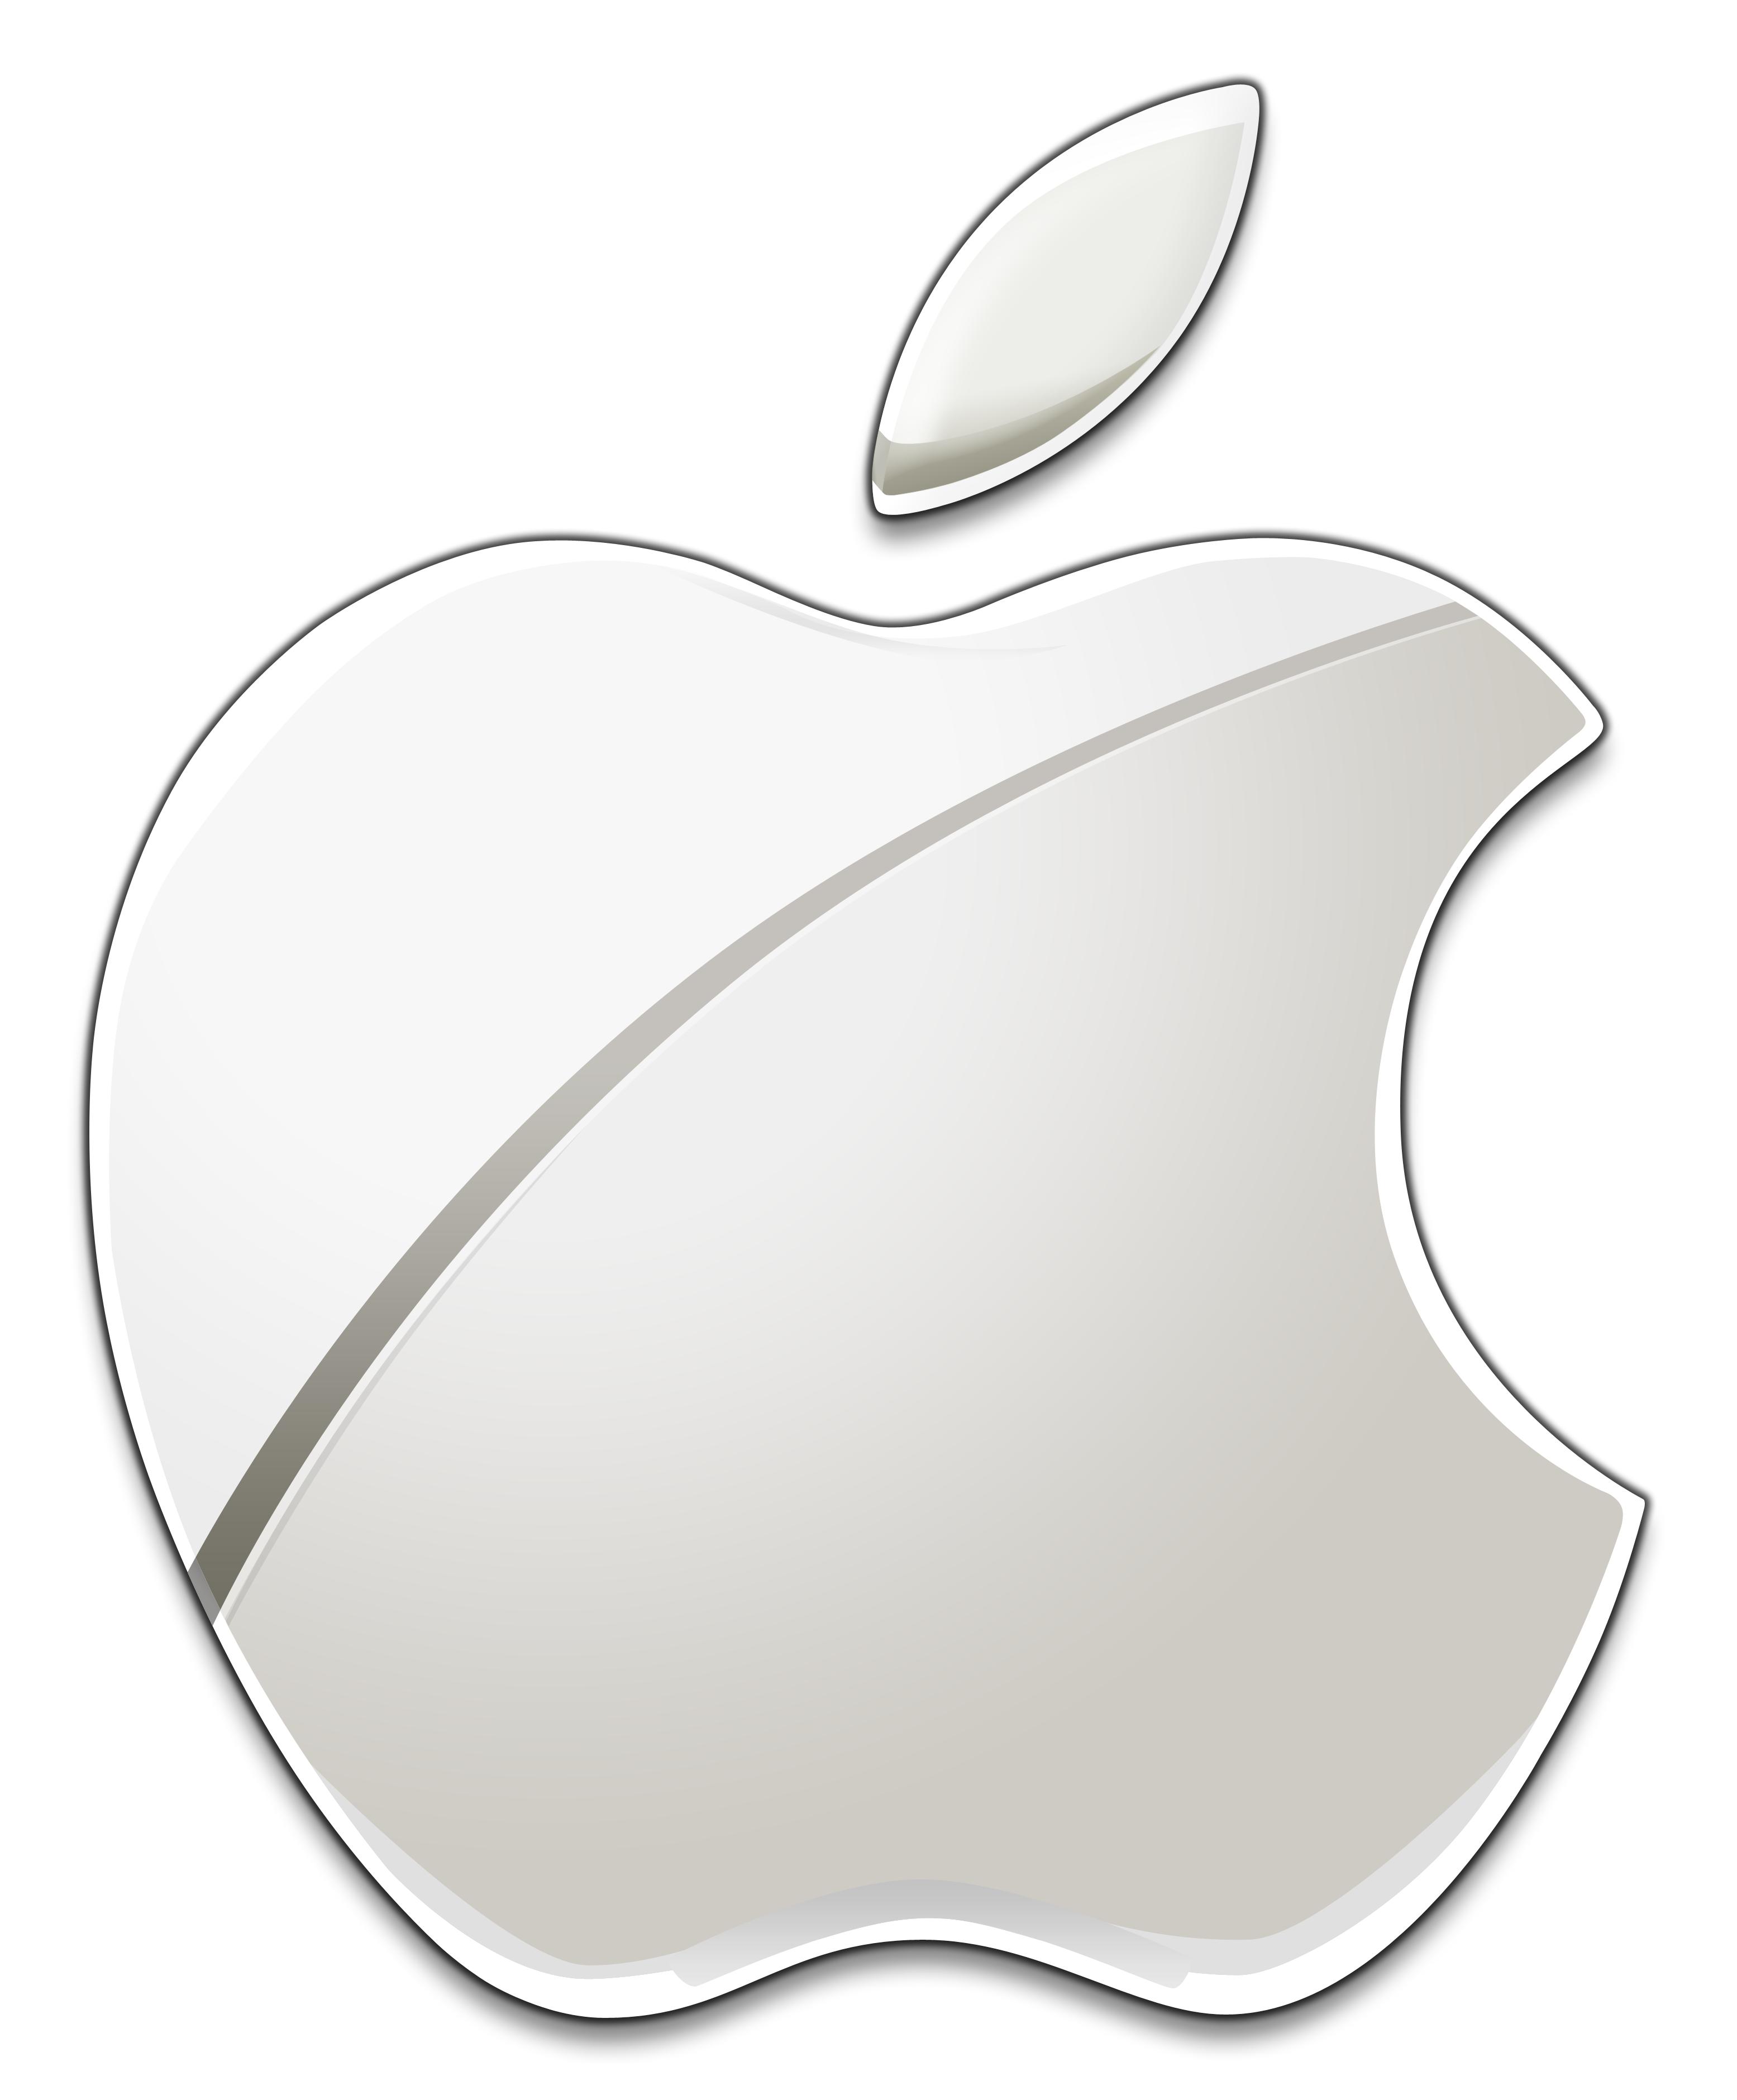 Apple HD PNG Transparent Apple HD.PNG Images..